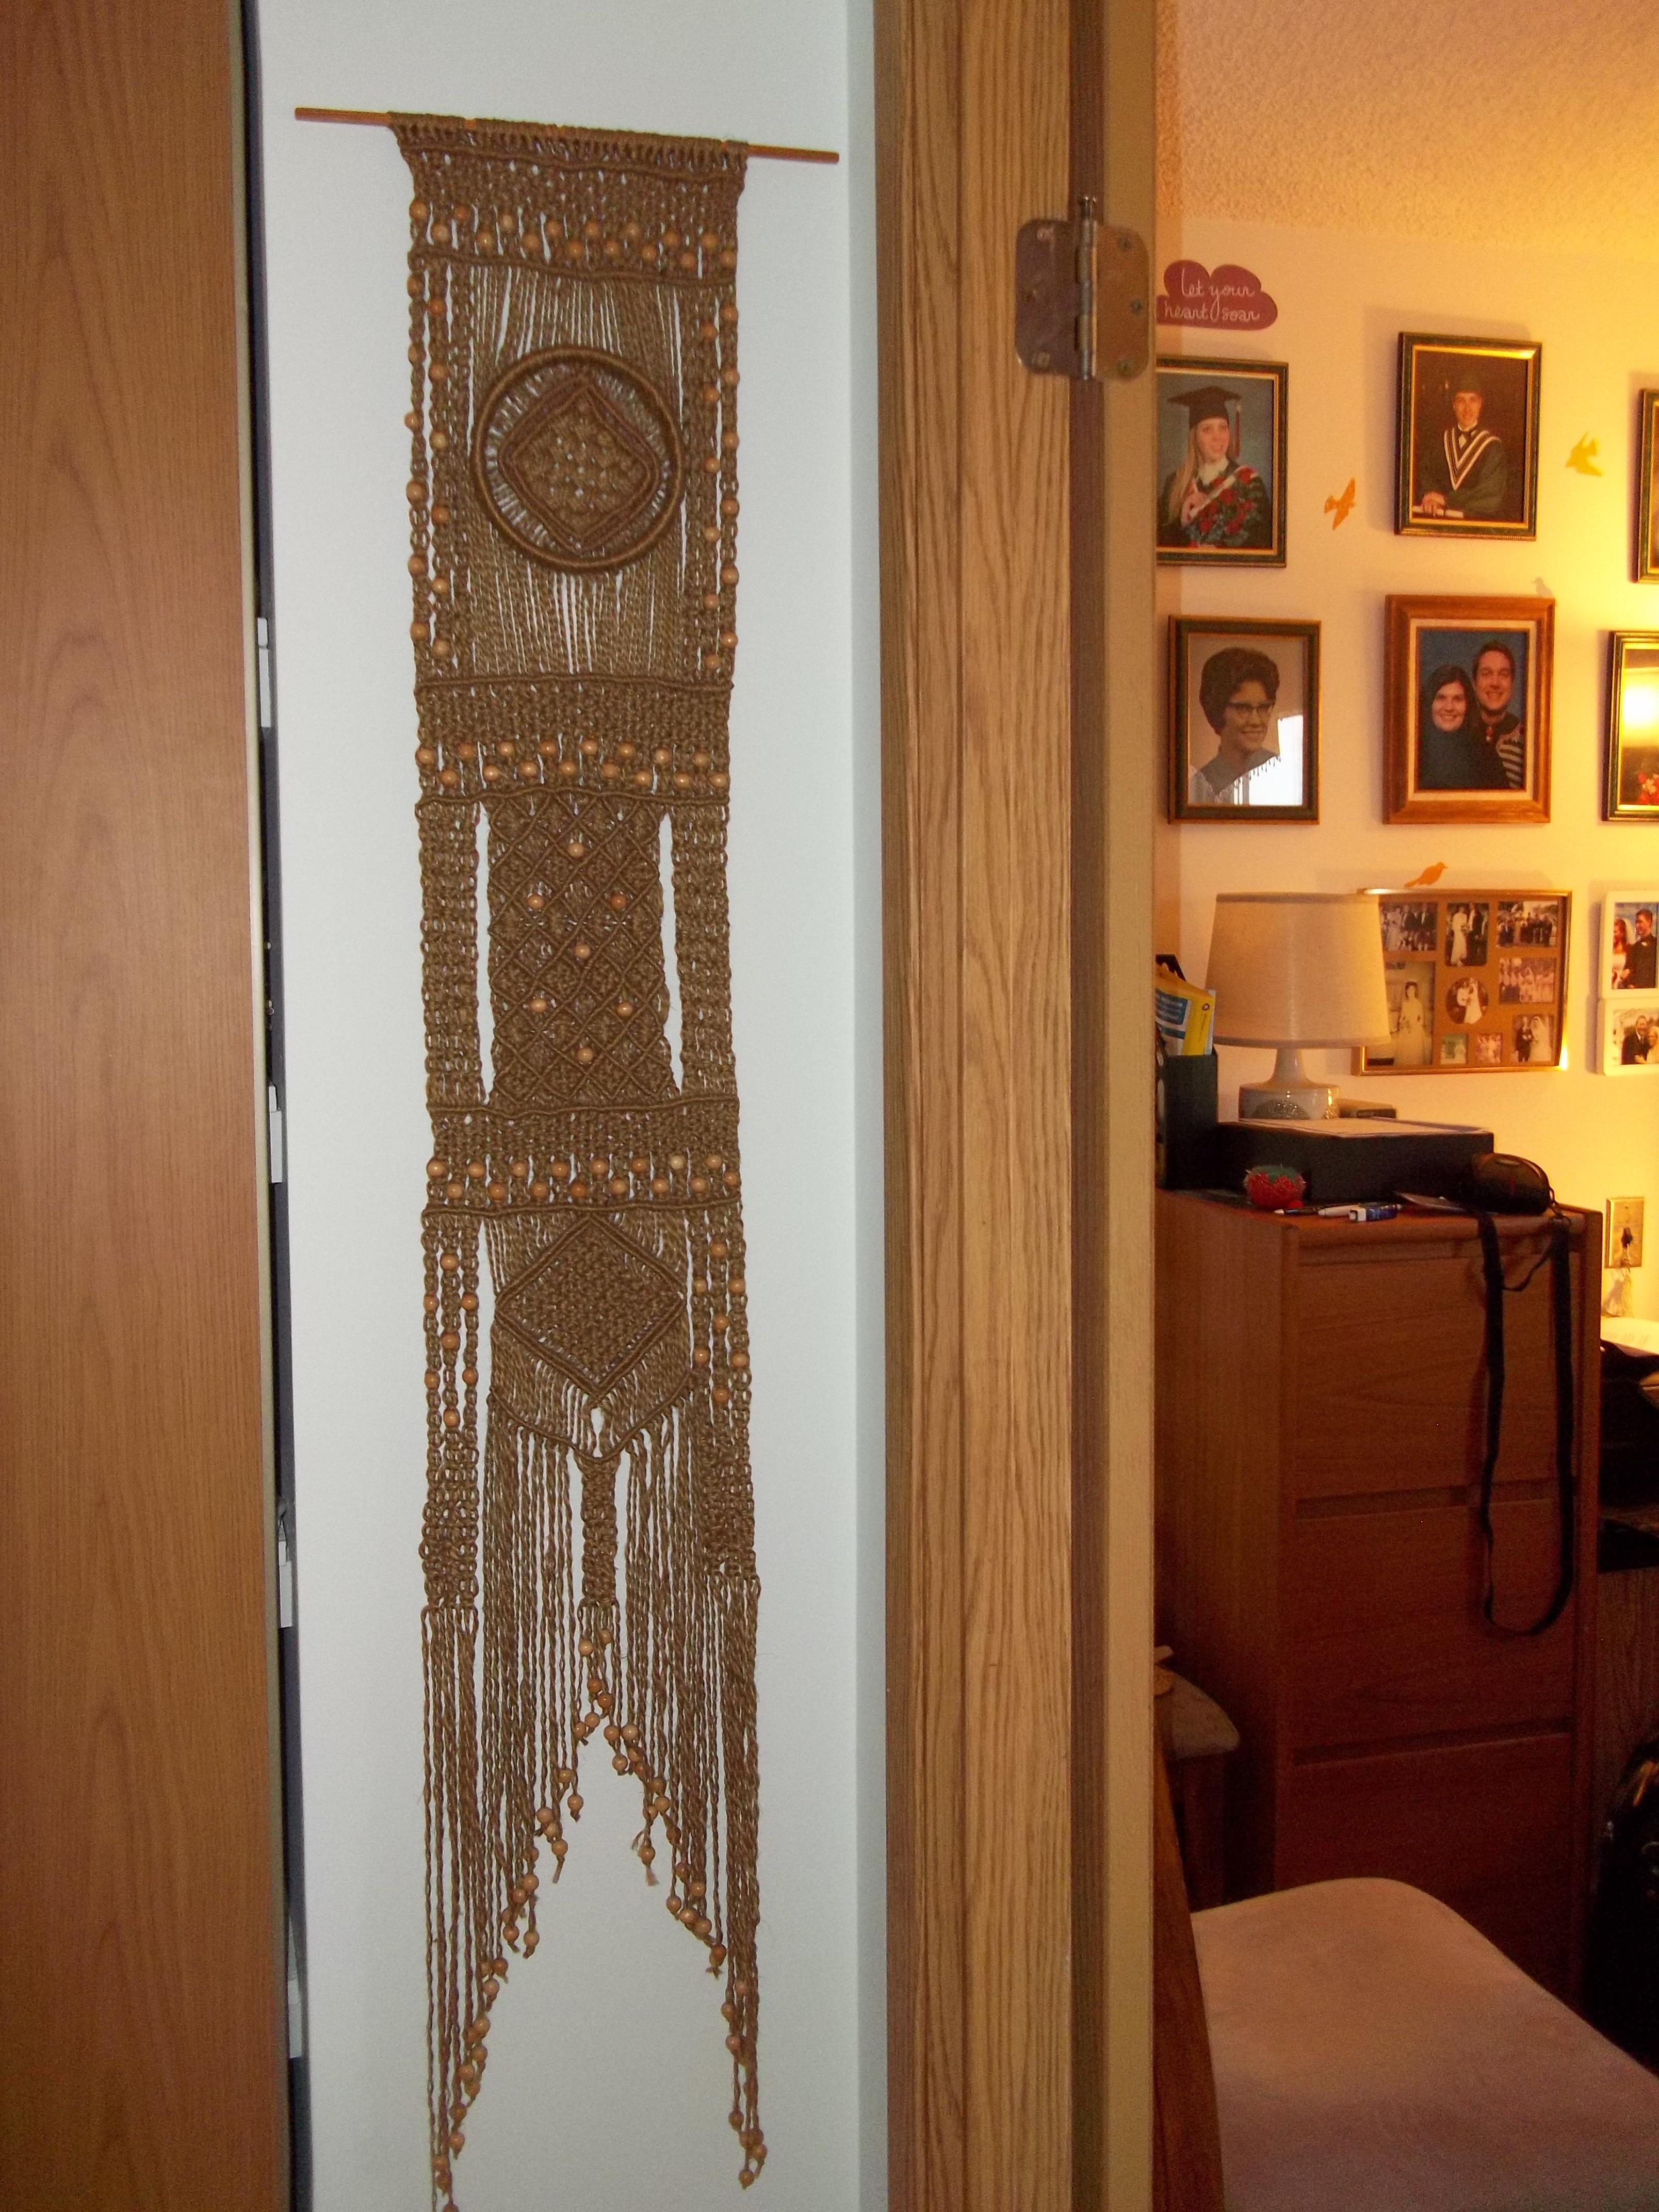 Hallway to Den - Macrame Hanging